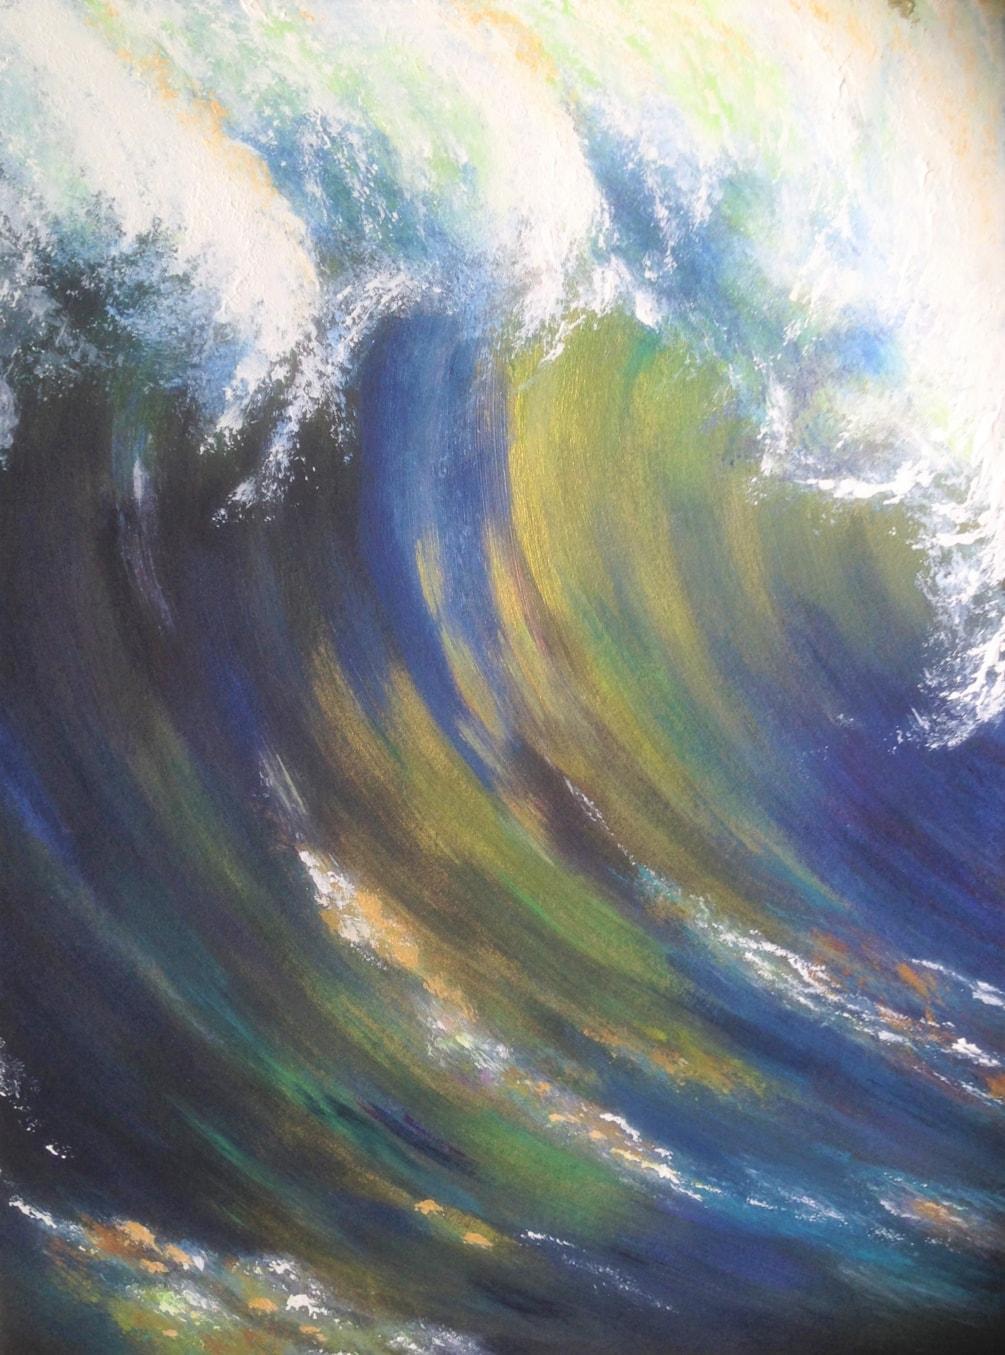 Golden Wave Aug 19 12x15 £190